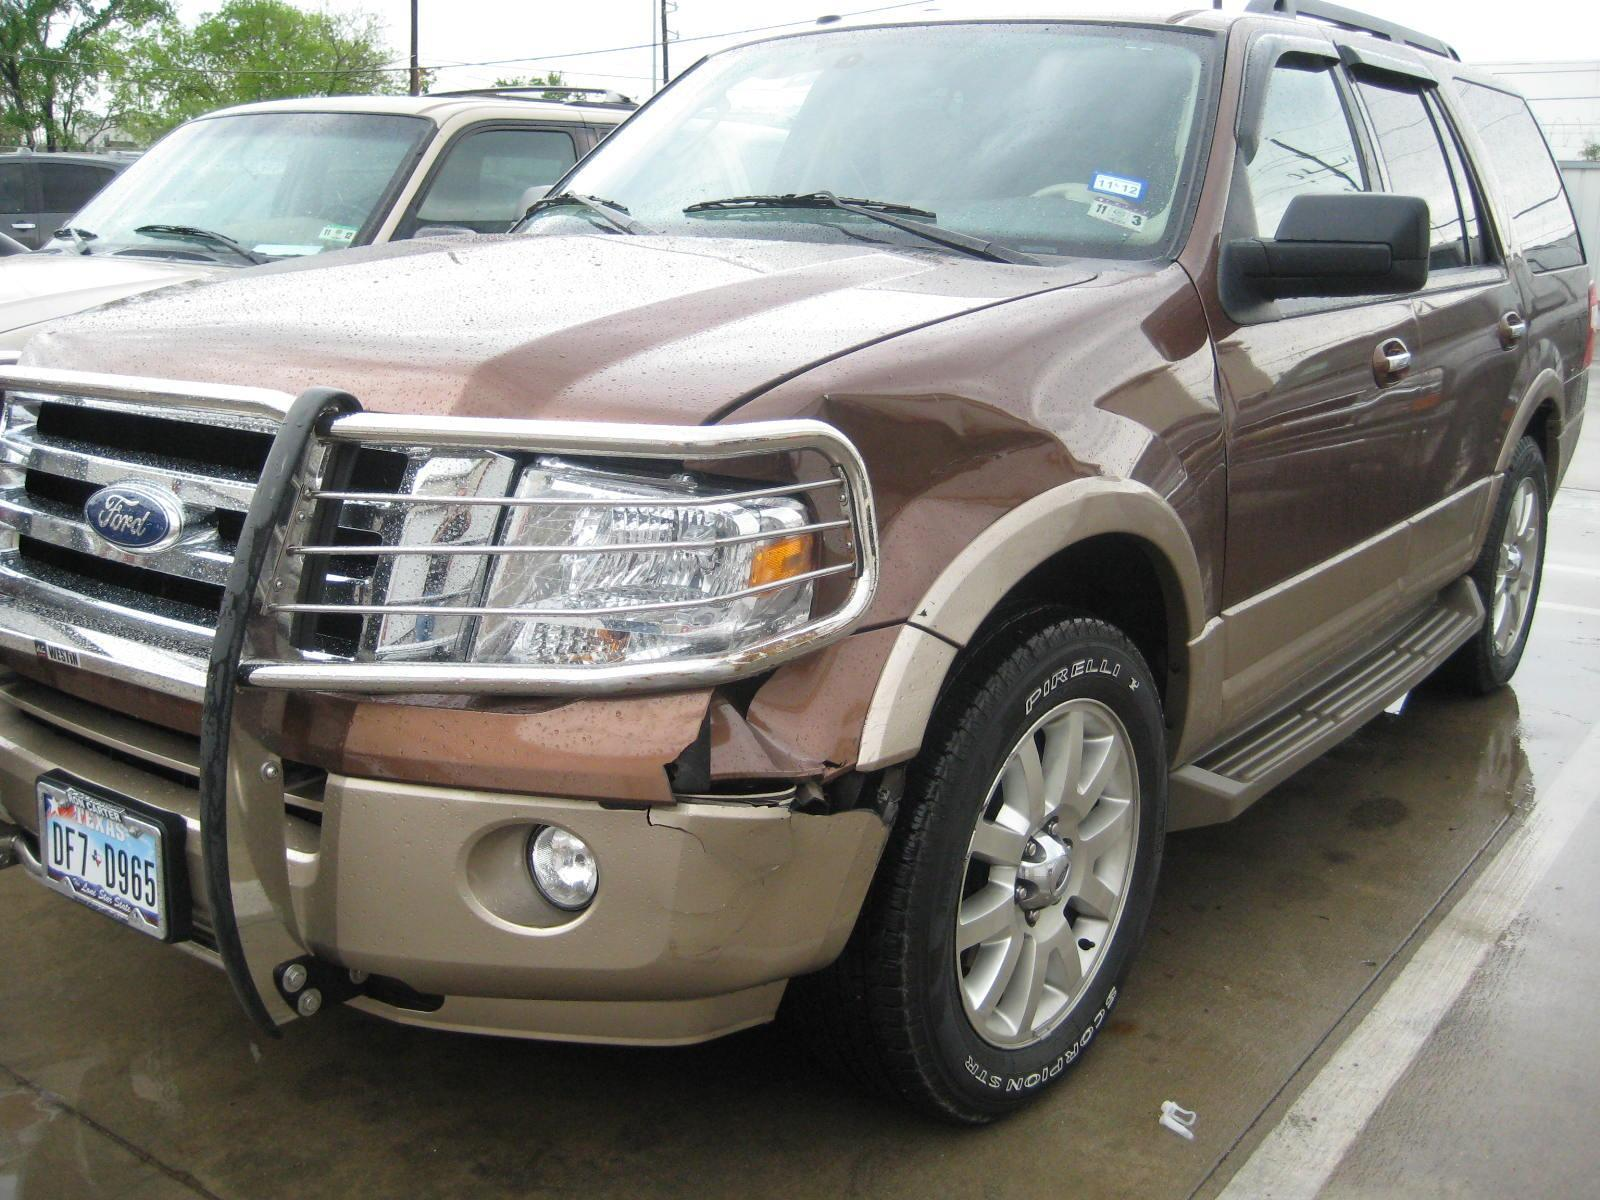 Beaumont Texas Airport Car Rental